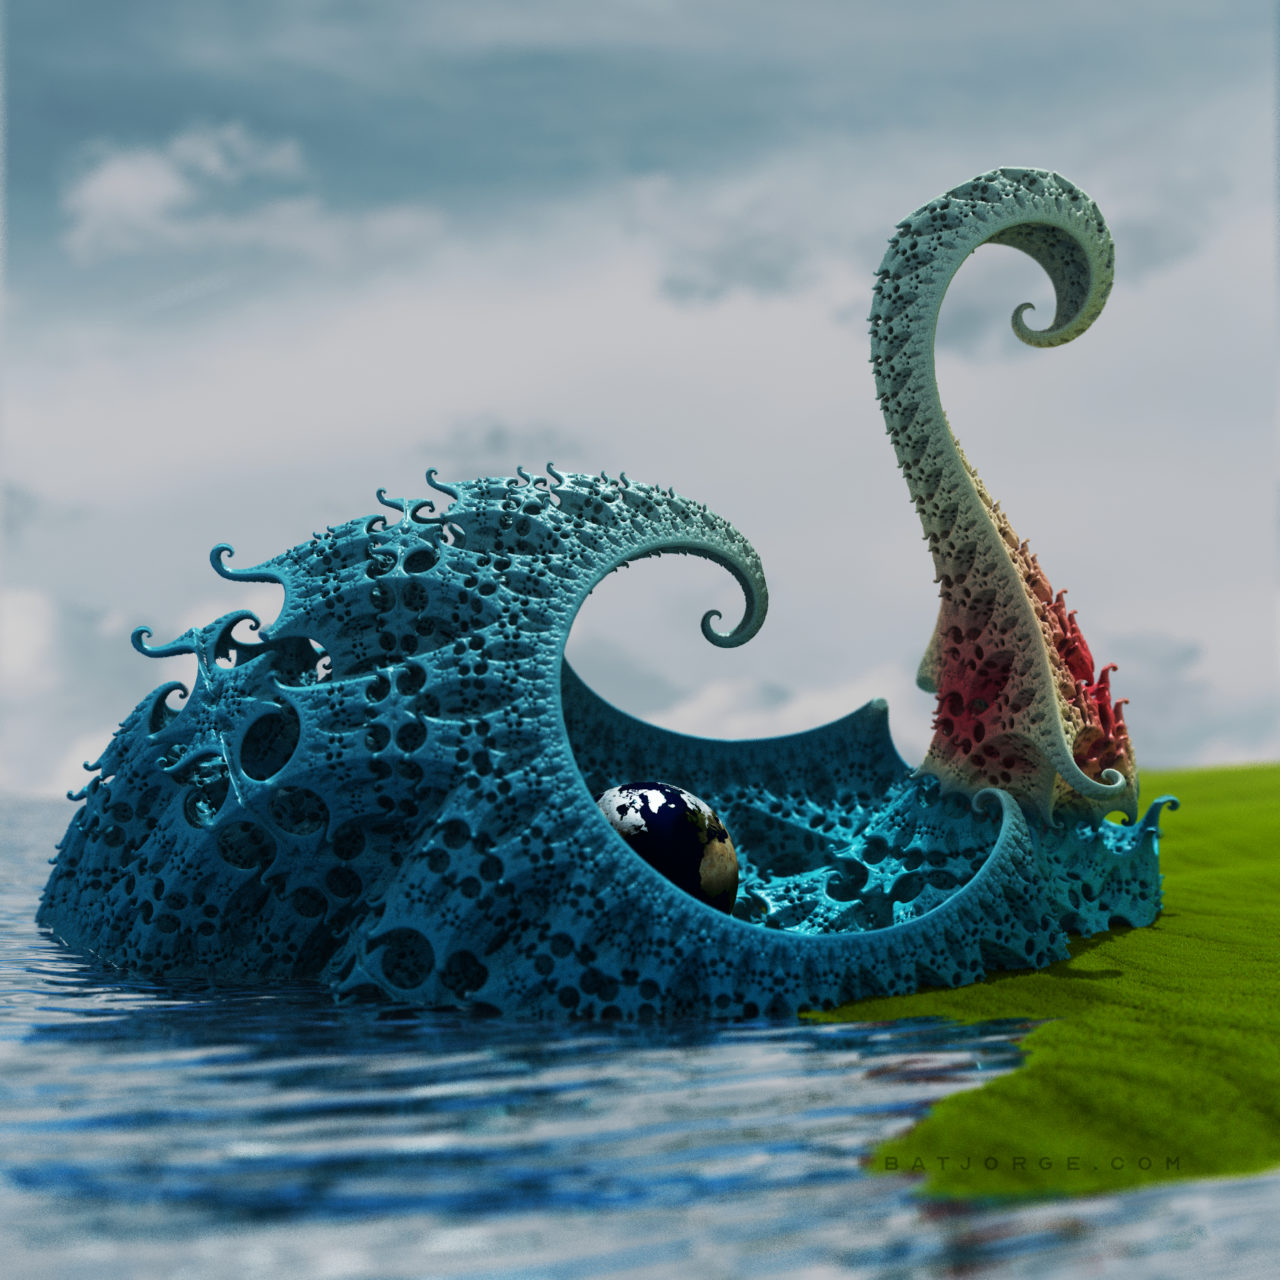 3d fractal. kleinian. mandelbulber water earth sphere